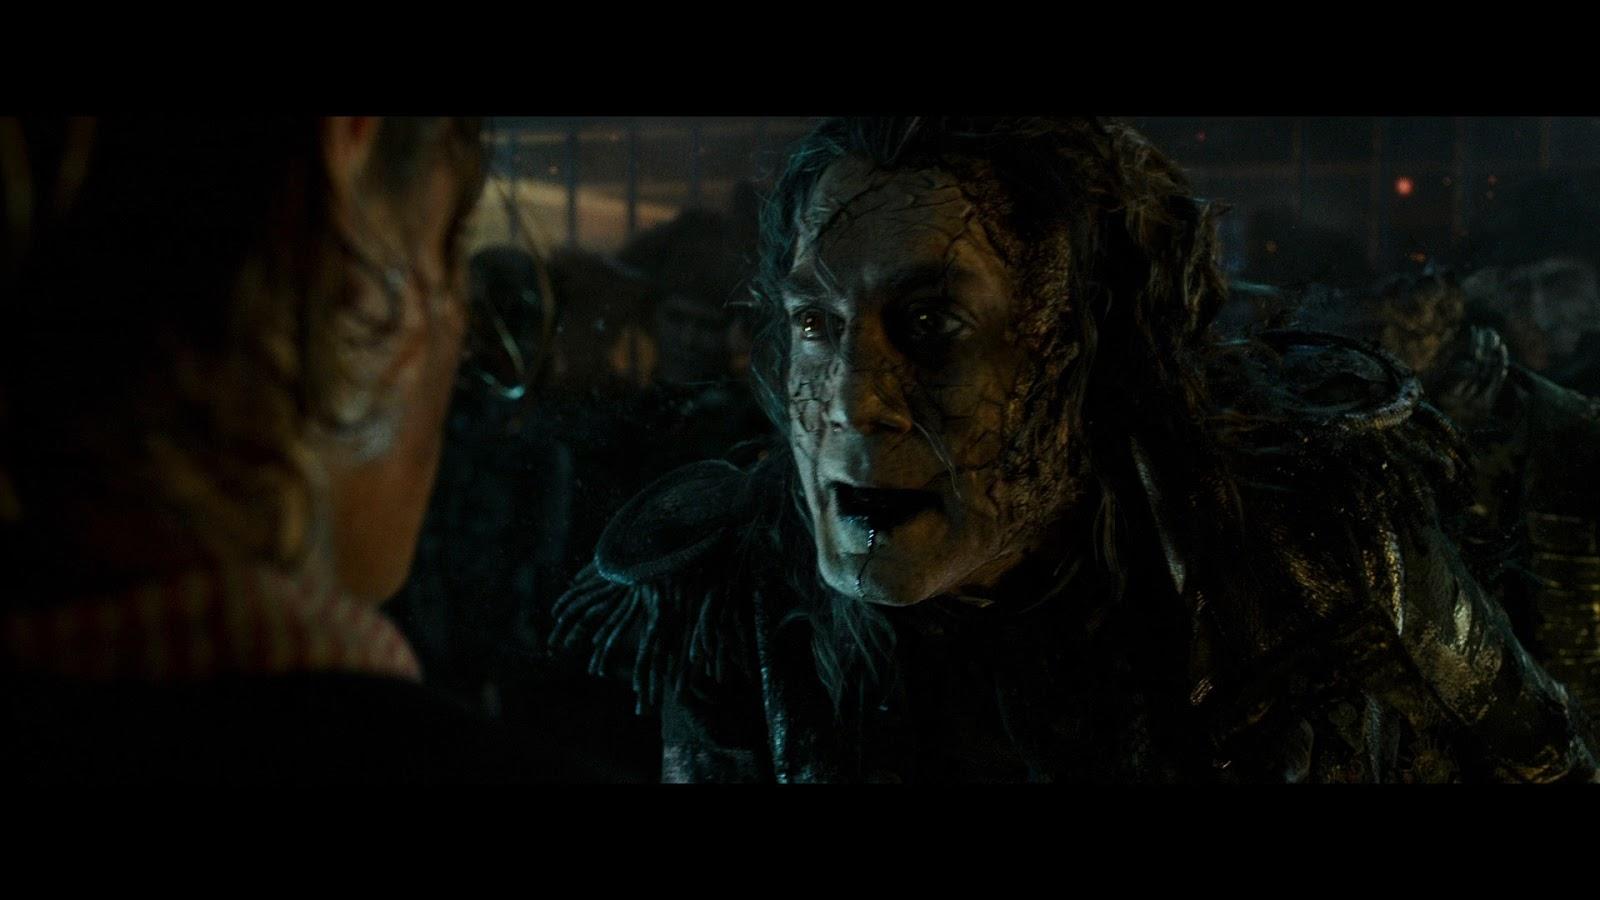 Piratas del Caribe 5: La venganza de Salazar (2017) Full HD 1080p Español Latino - Castellano - Ingles Captura 1